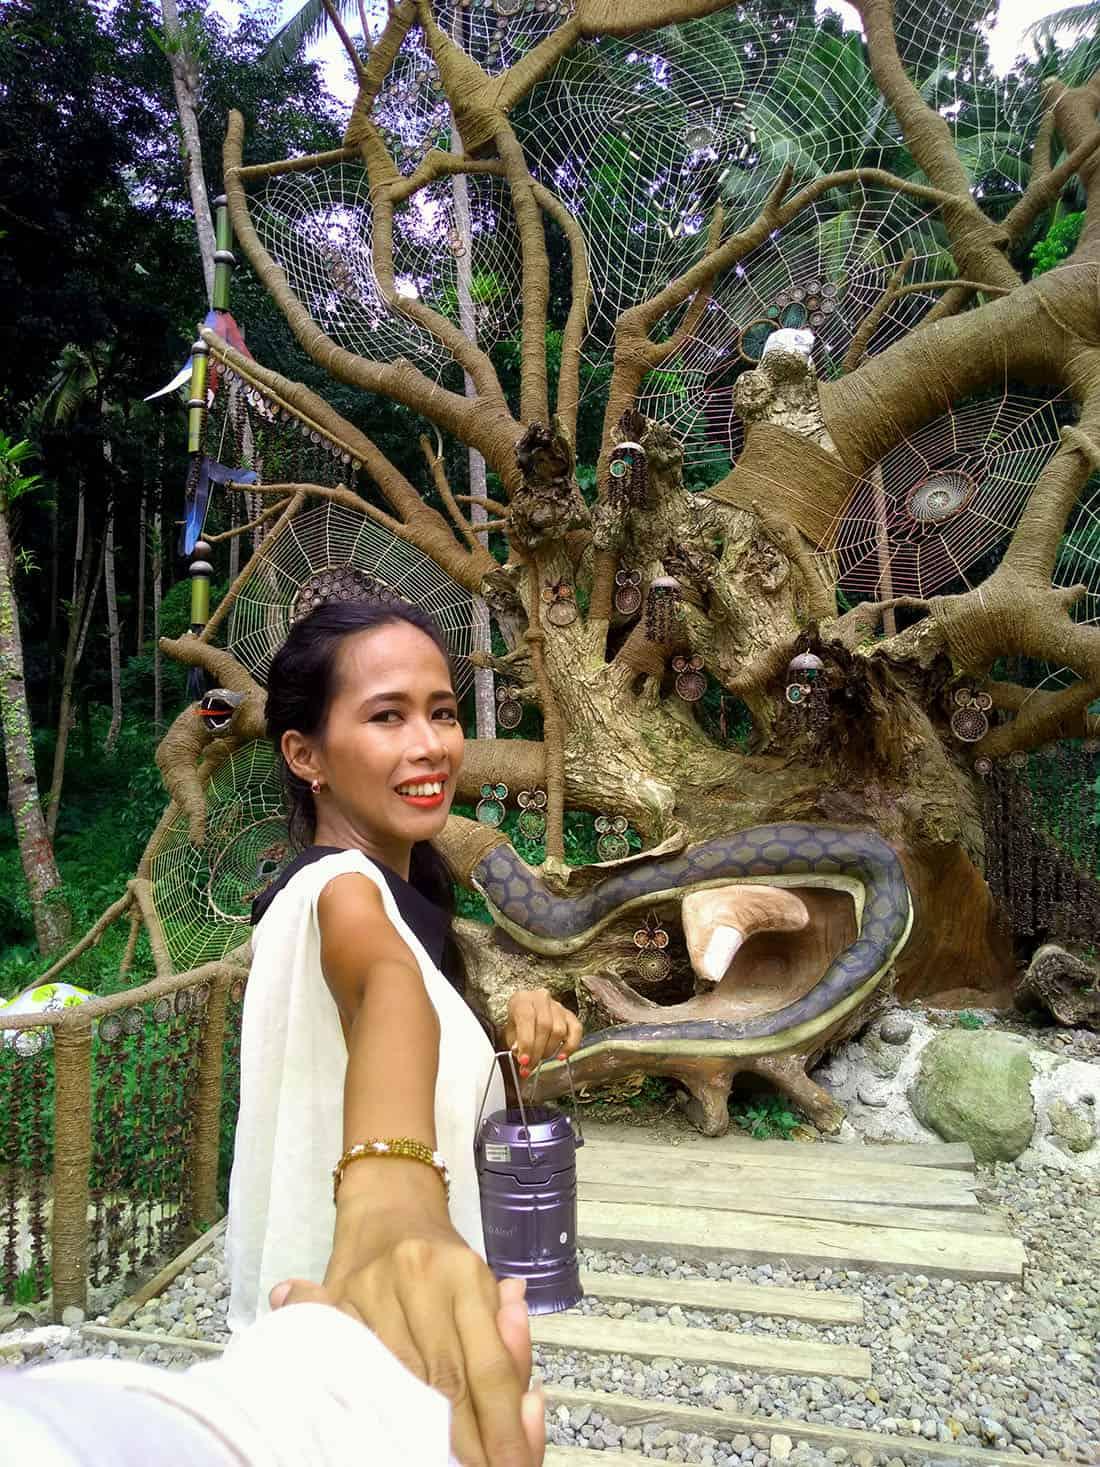 Traveler Tuesday - Maria of Travel With Maria 2